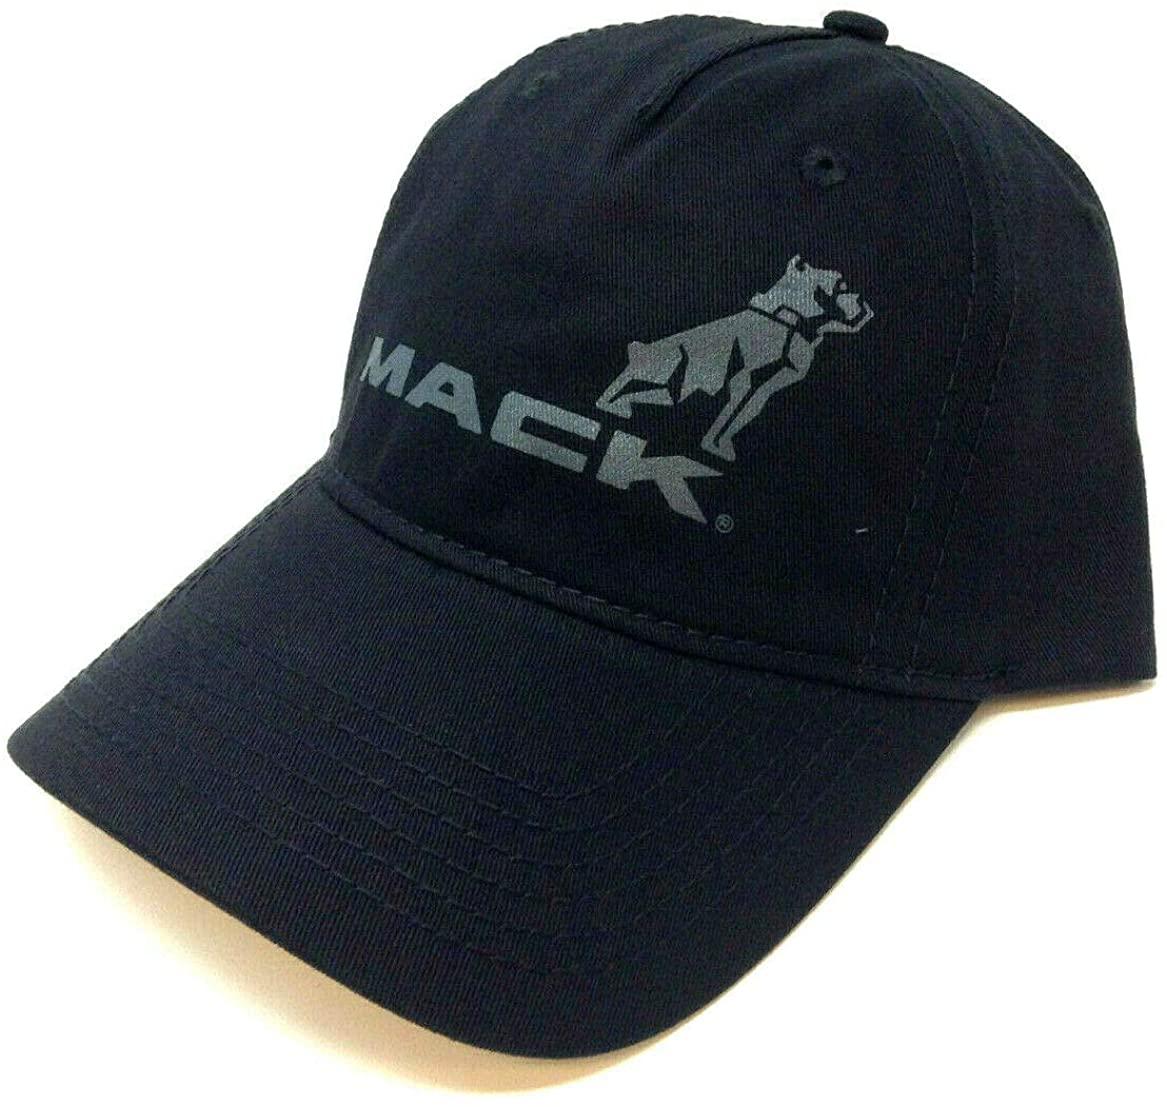 Mack Black Trucks Bulldog Logo Slouch Curved Bill Adjustable Hat